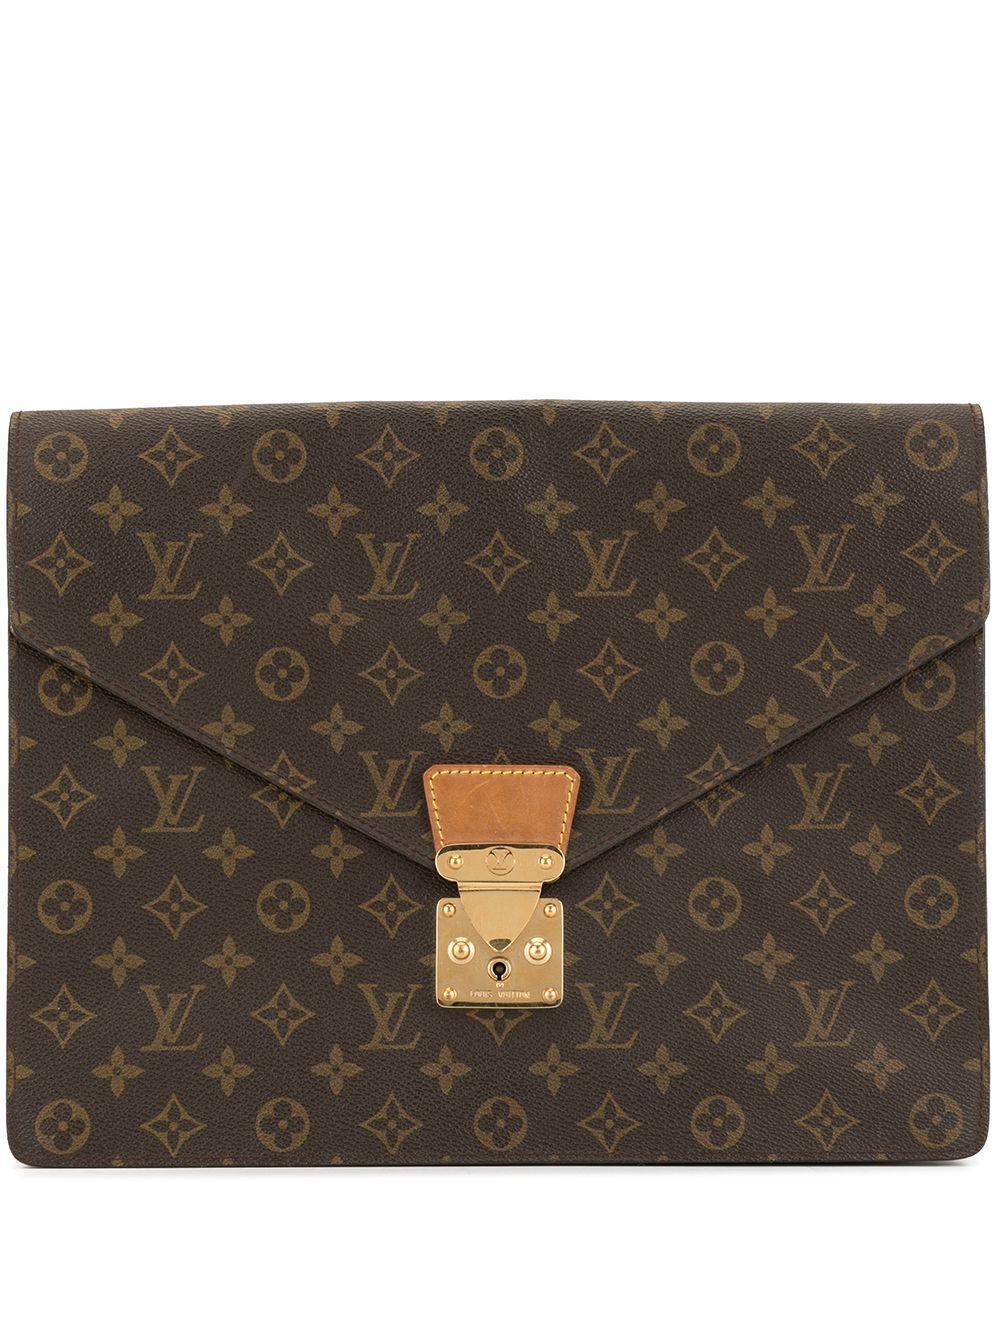 Louis Vuitton 1990s Pre Owned Monogram Envelope Clutch Farfetch In 2020 Louis Vuitton Vuitton Vintage Louis Vuitton